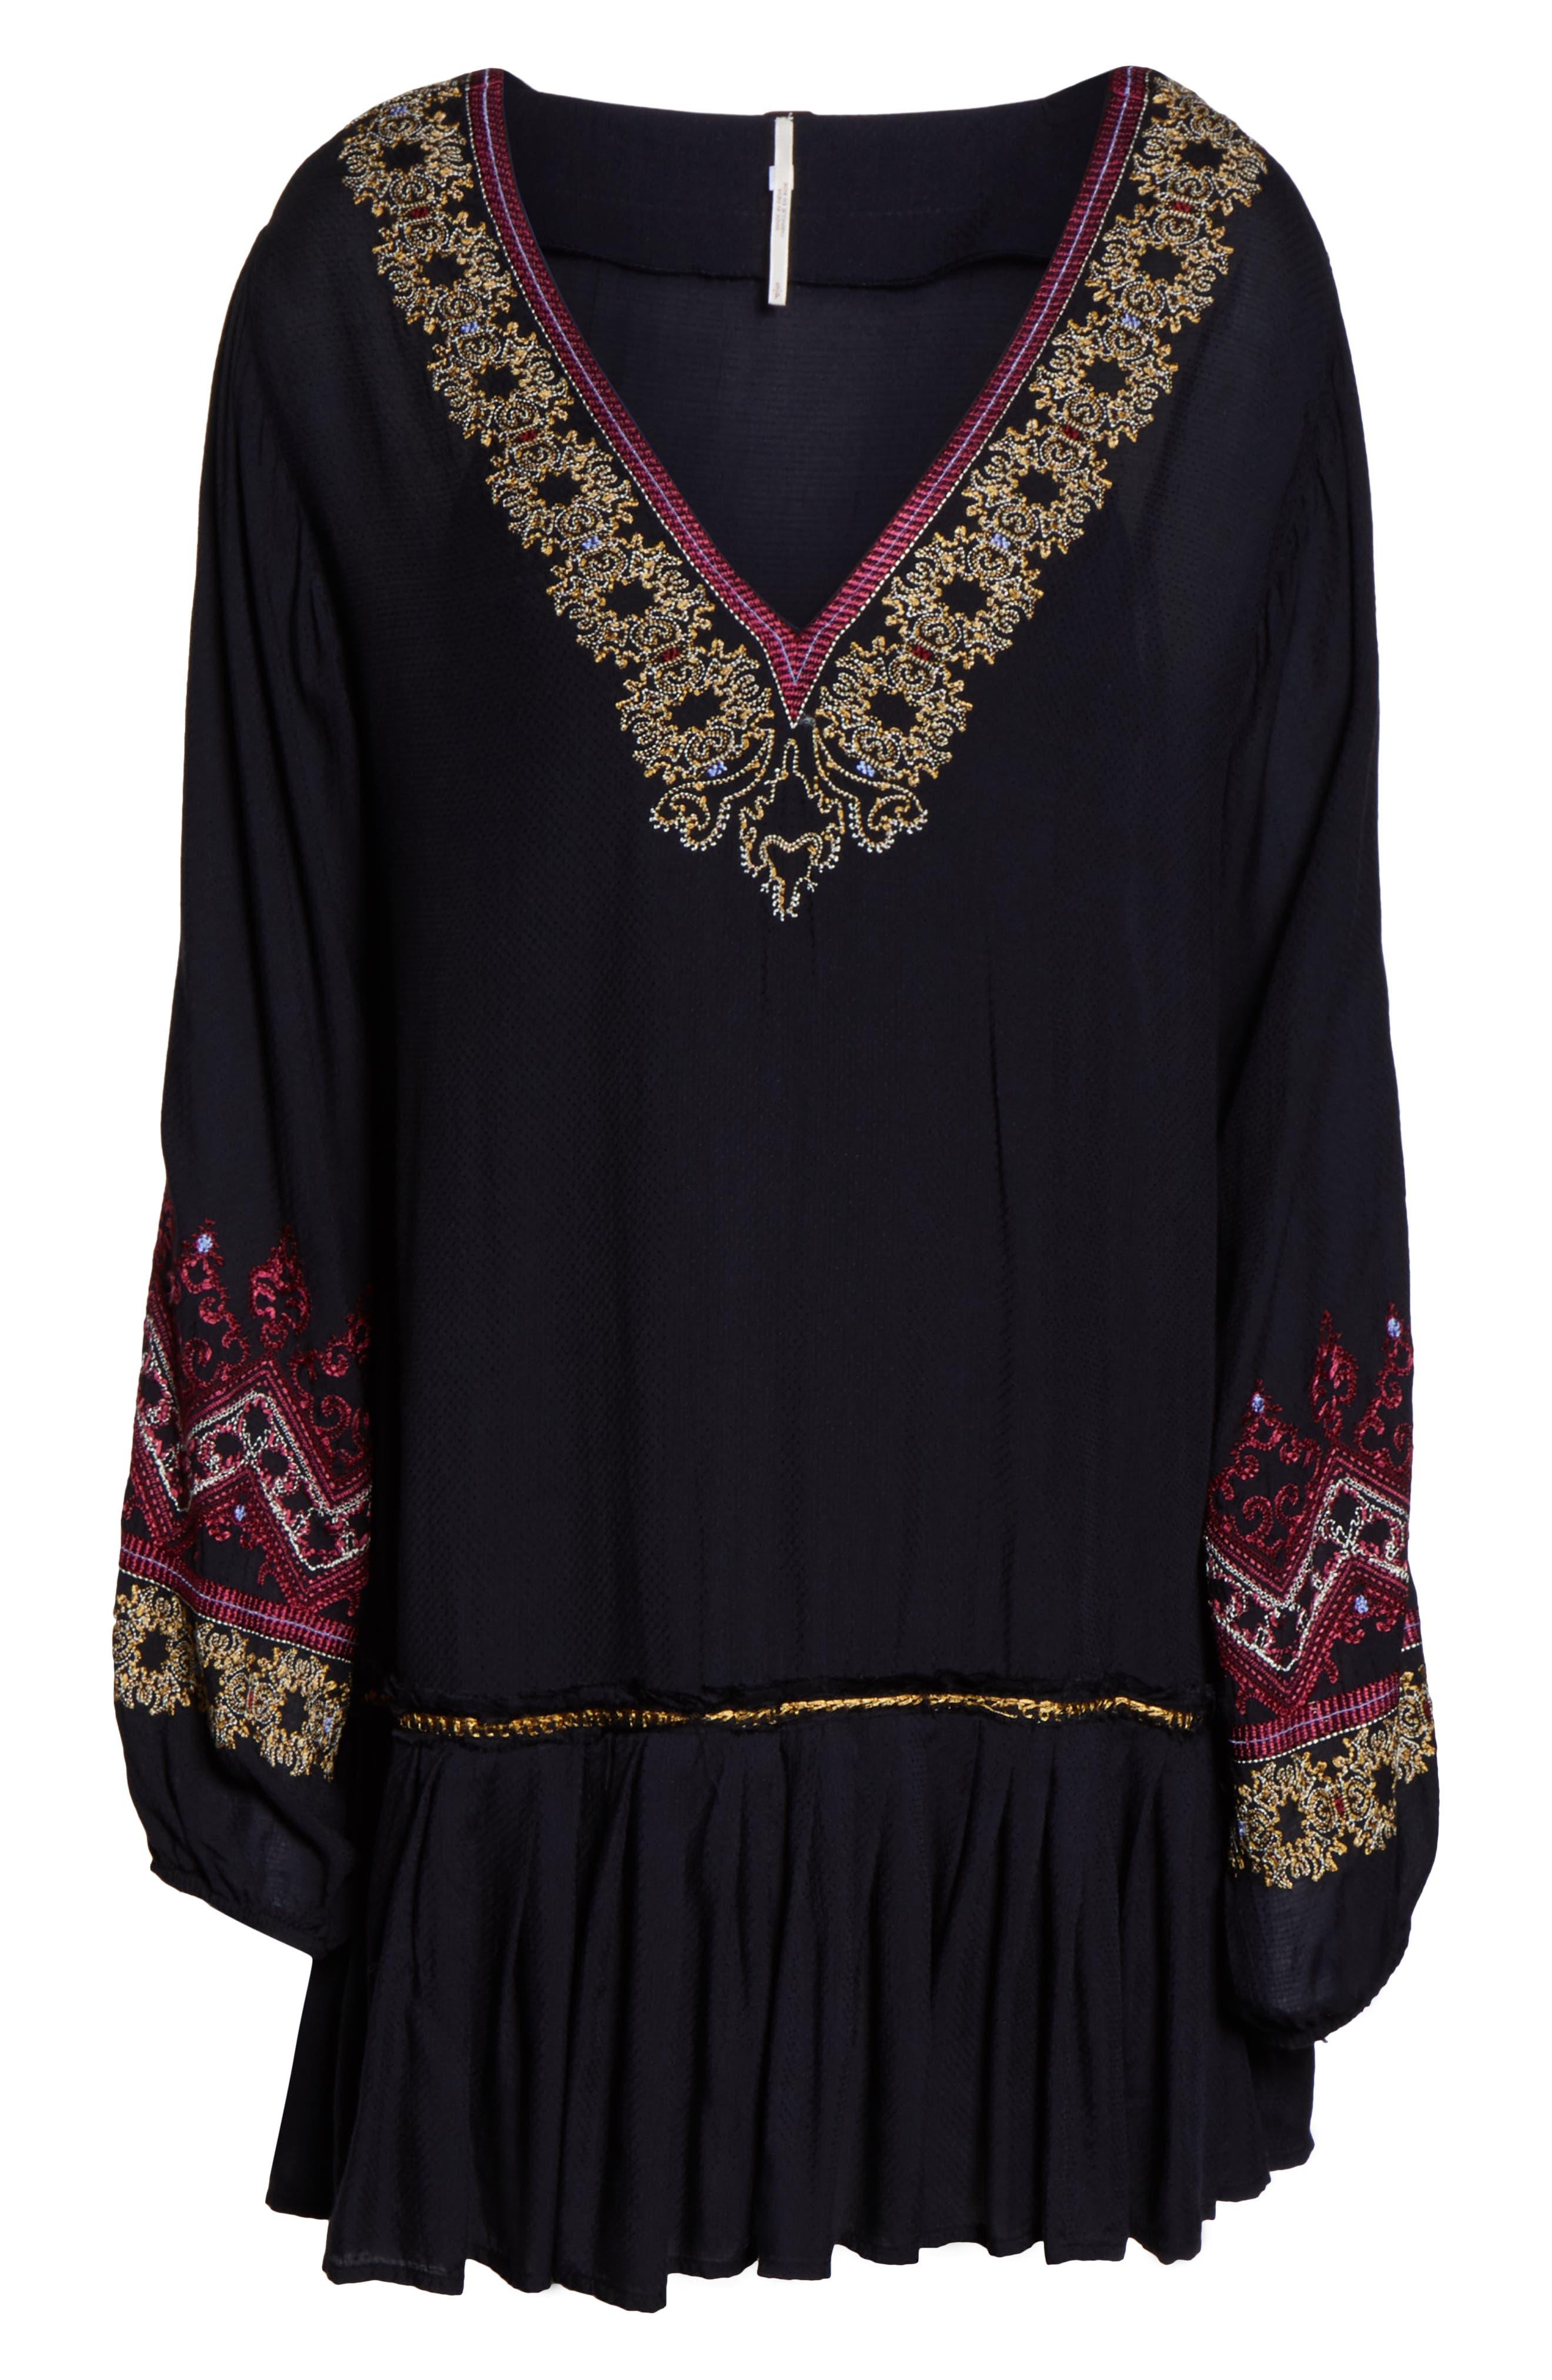 Wild One Embellished Dress,                             Alternate thumbnail 6, color,                             BLACK